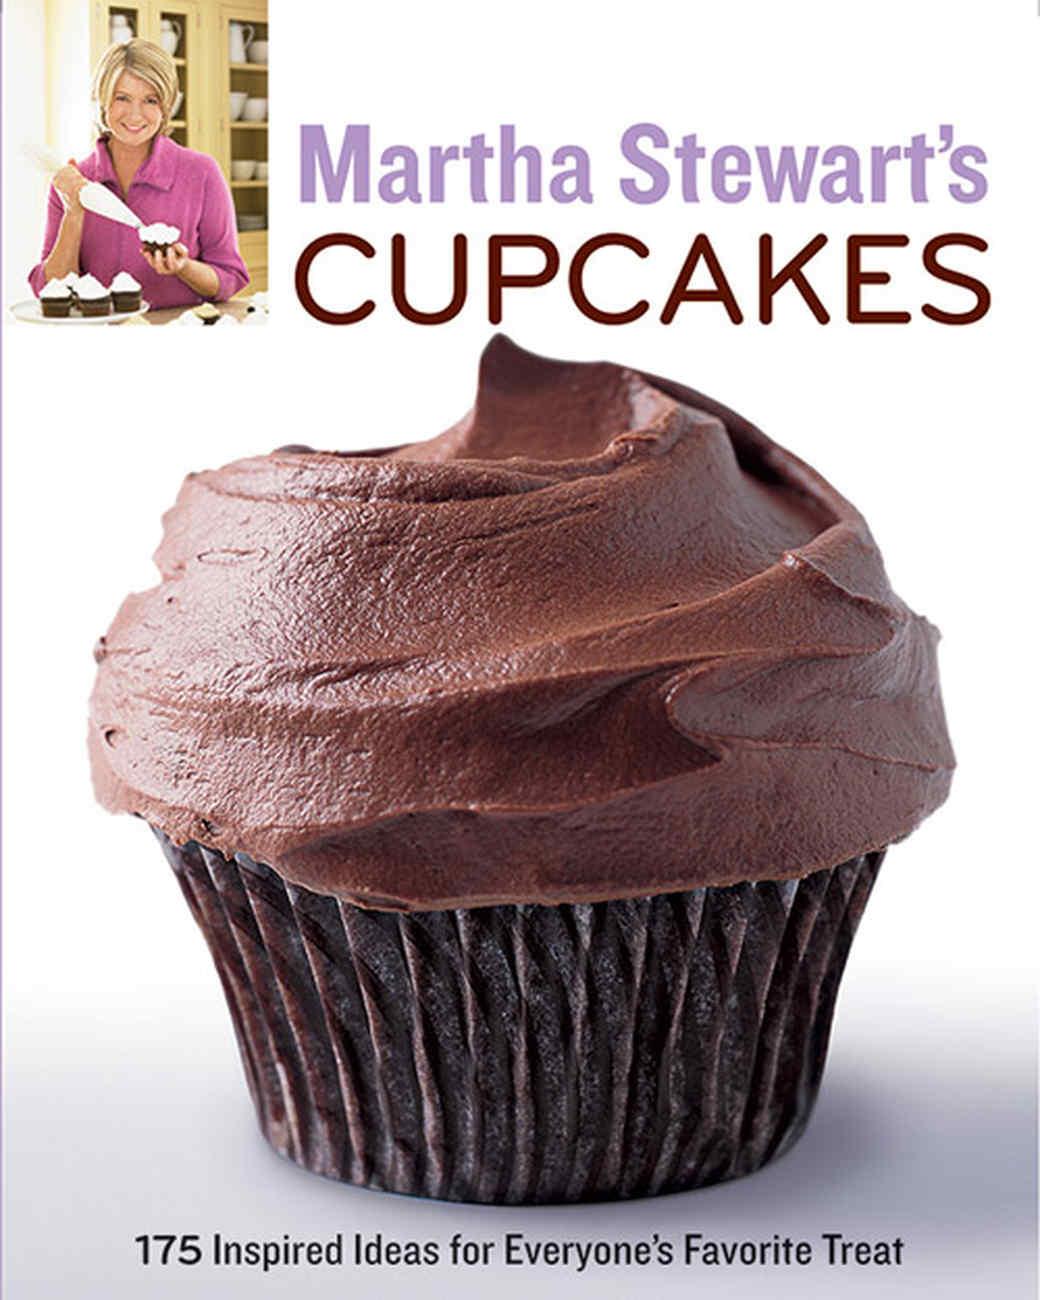 Martha stewart 39 s cupcakes martha stewart for Ideas for thanksgiving cupcake decorations